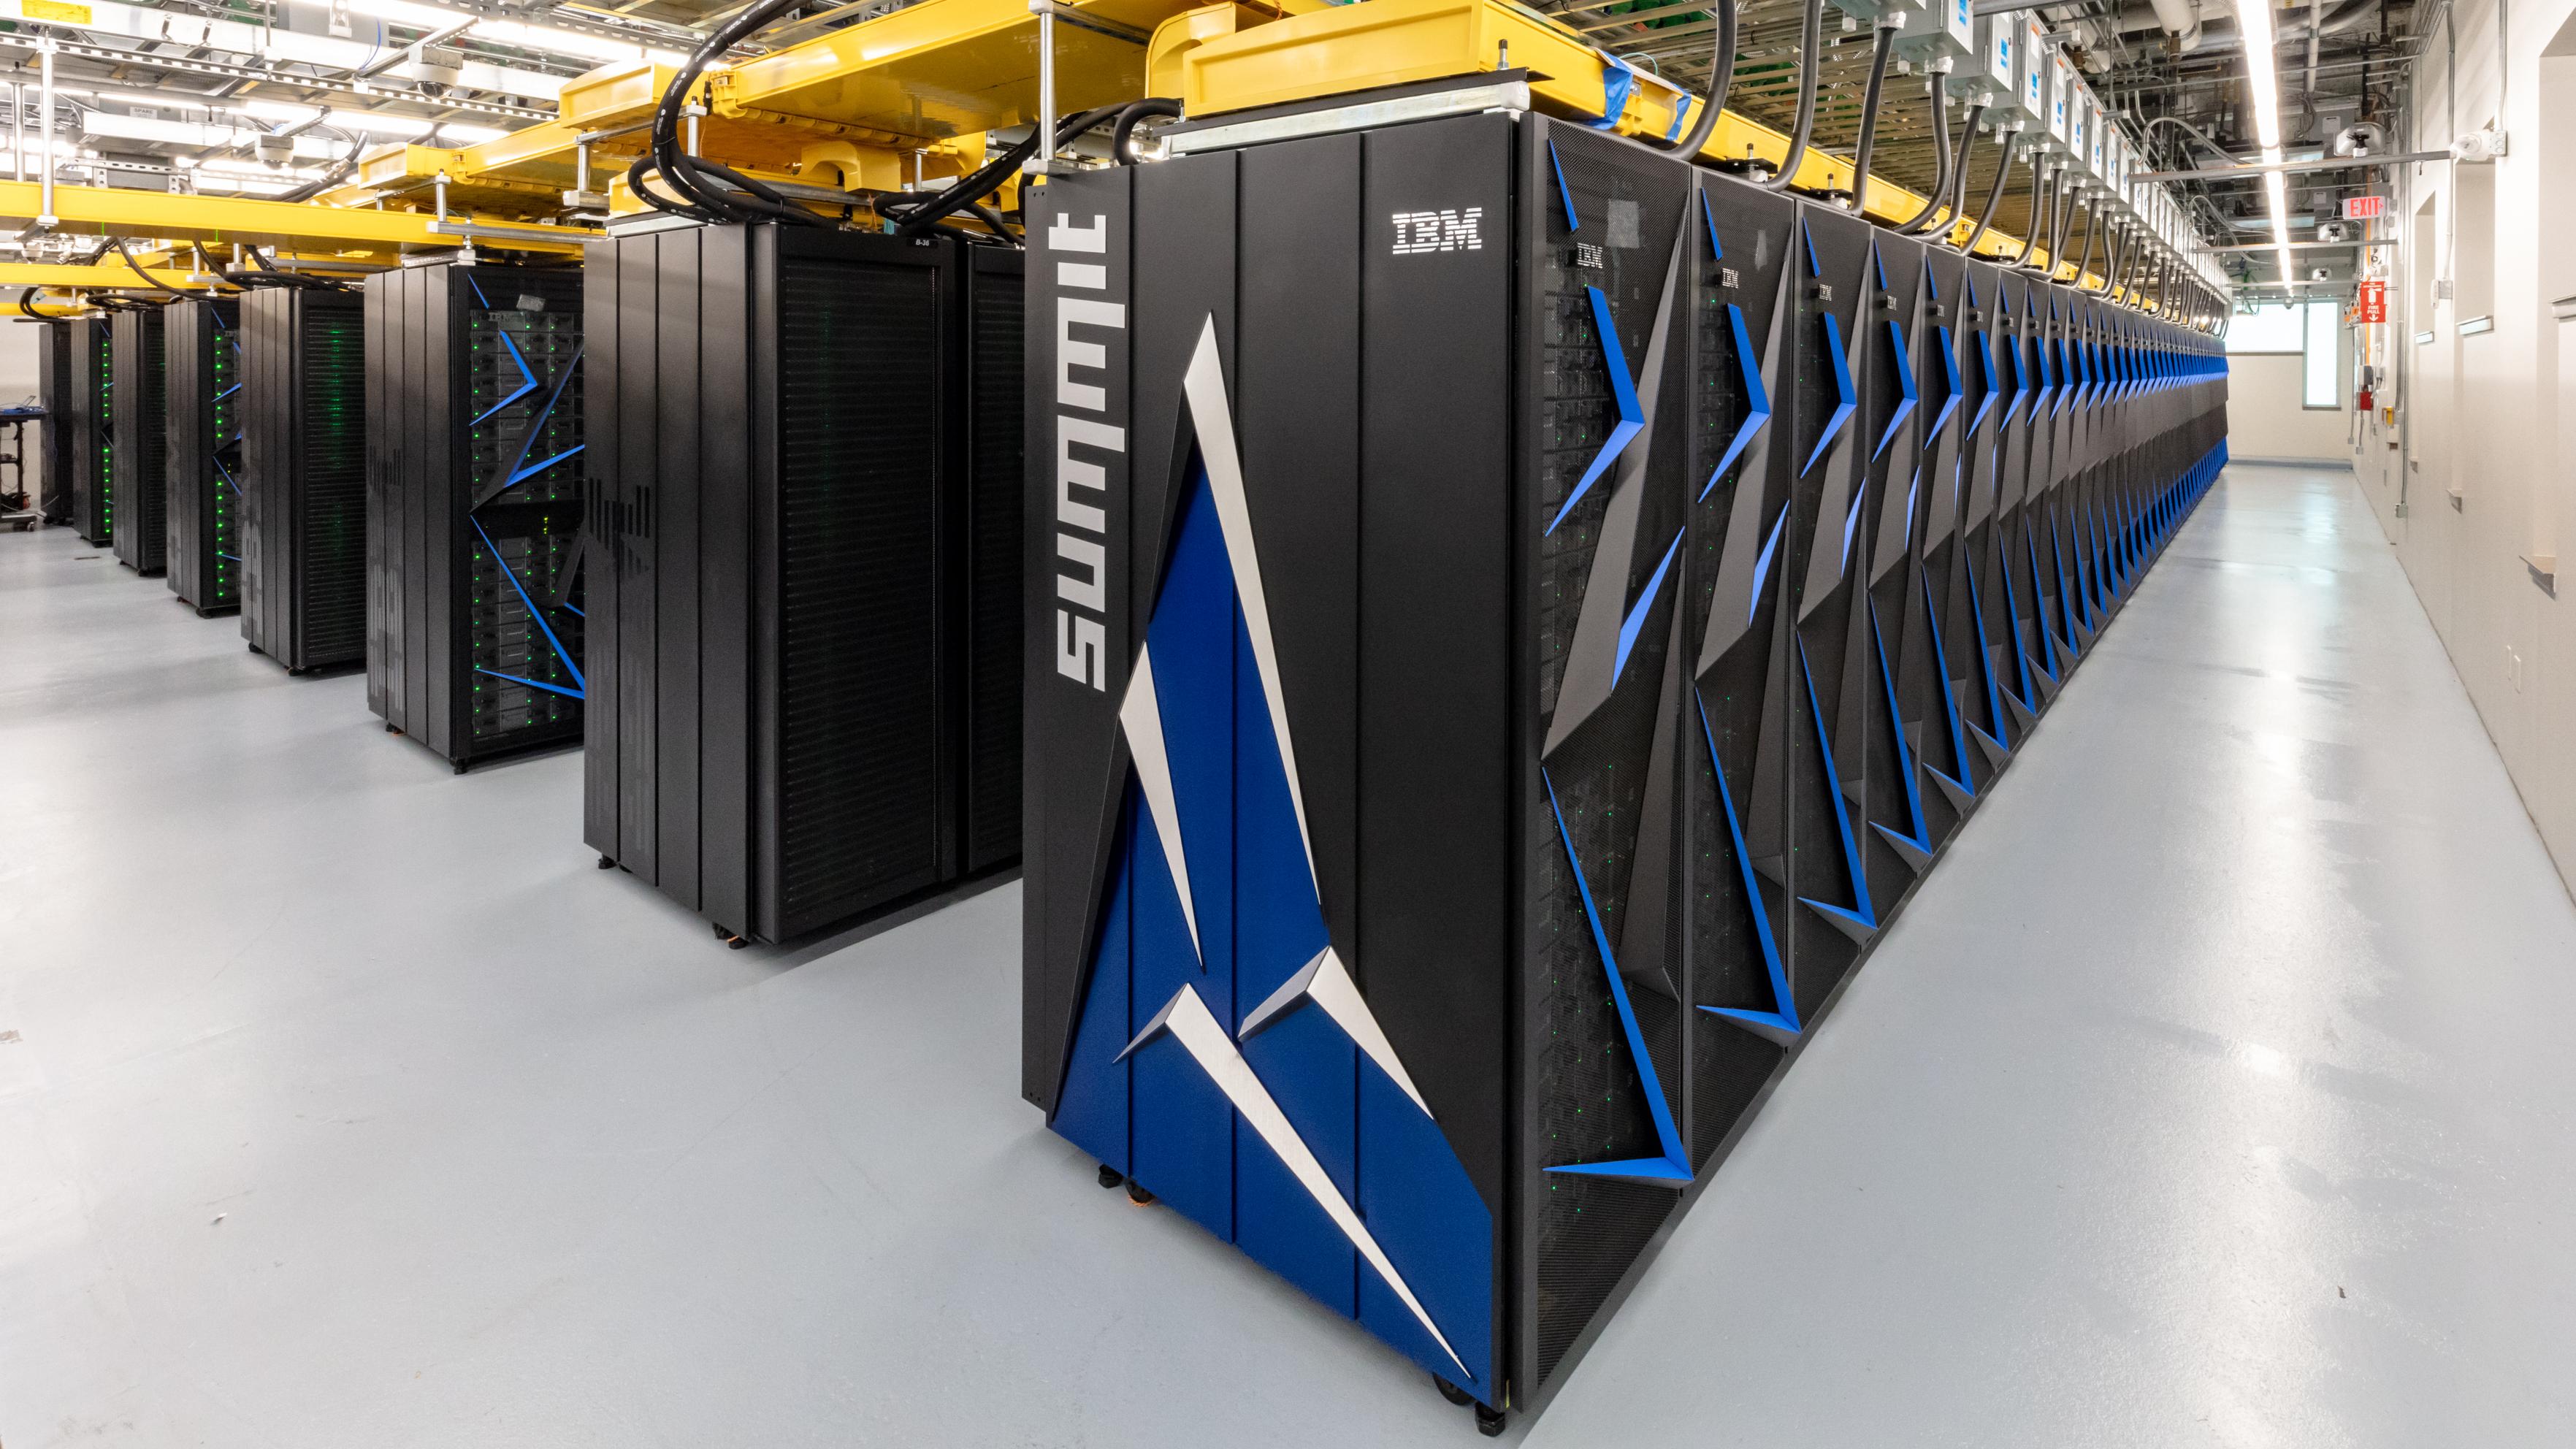 ornl launches summit supercomputer ornl. Black Bedroom Furniture Sets. Home Design Ideas